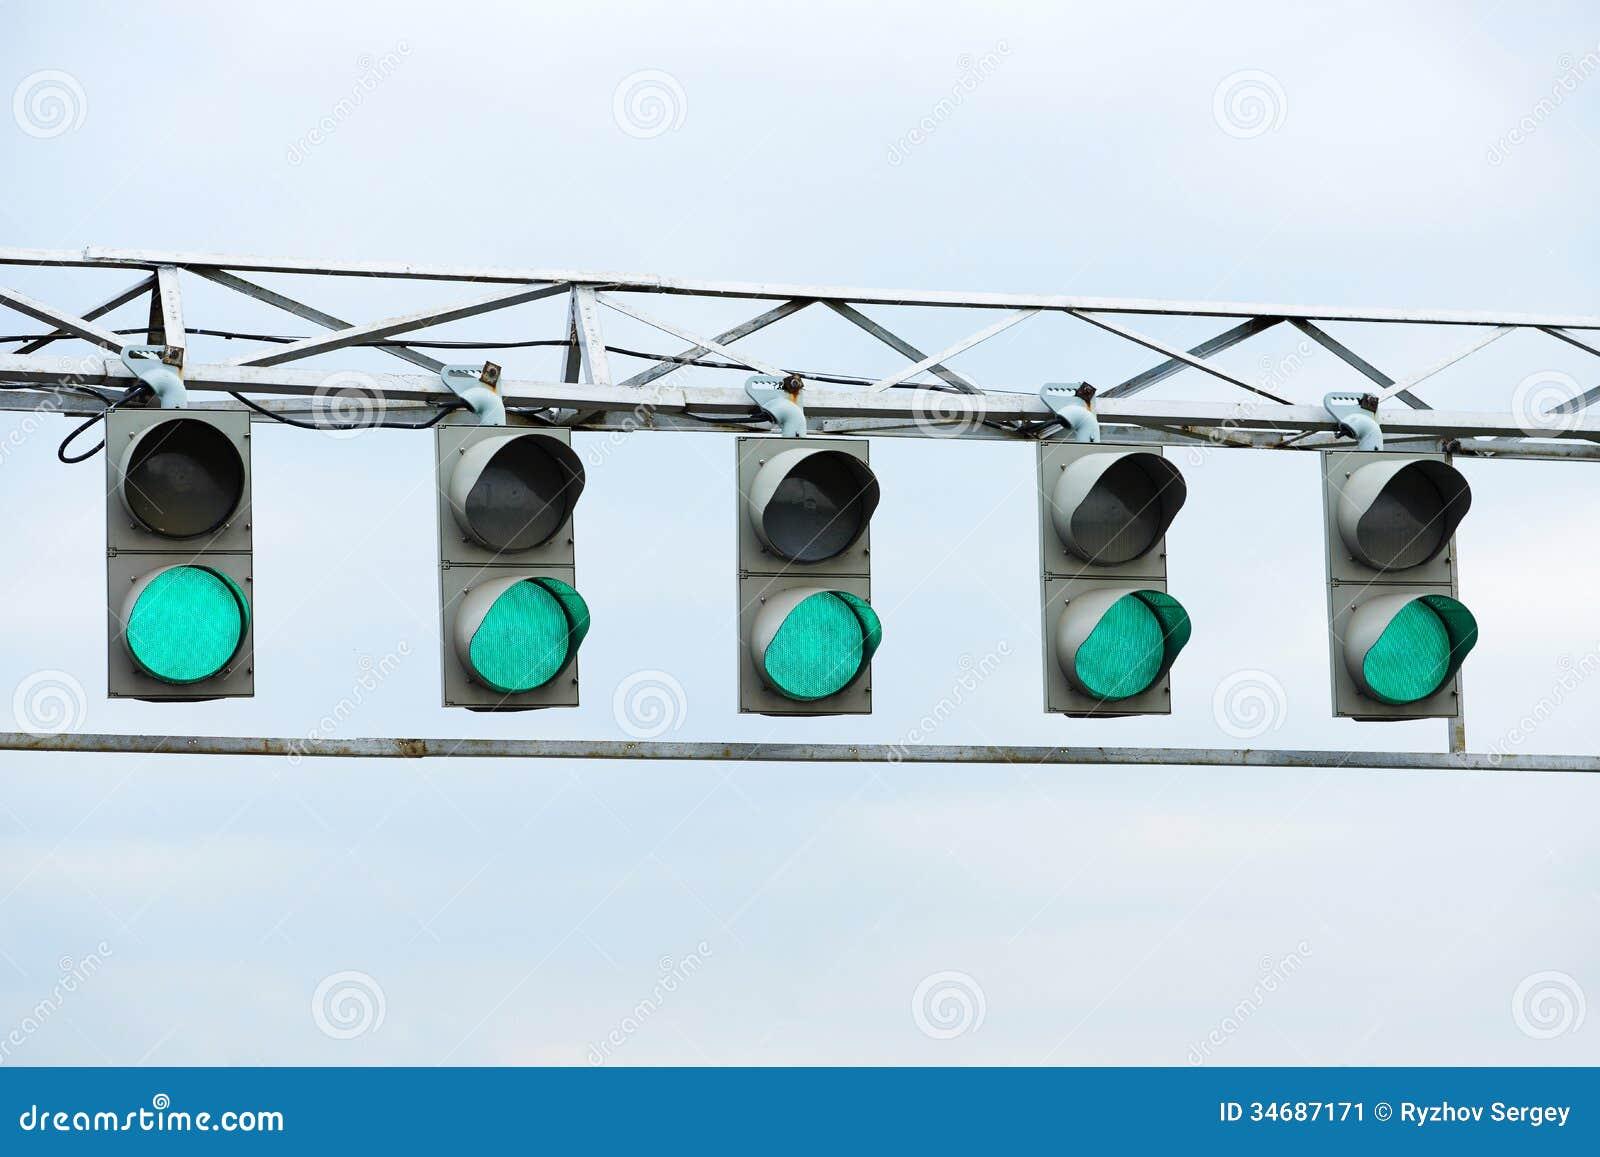 Gif Of Car Race Green Light